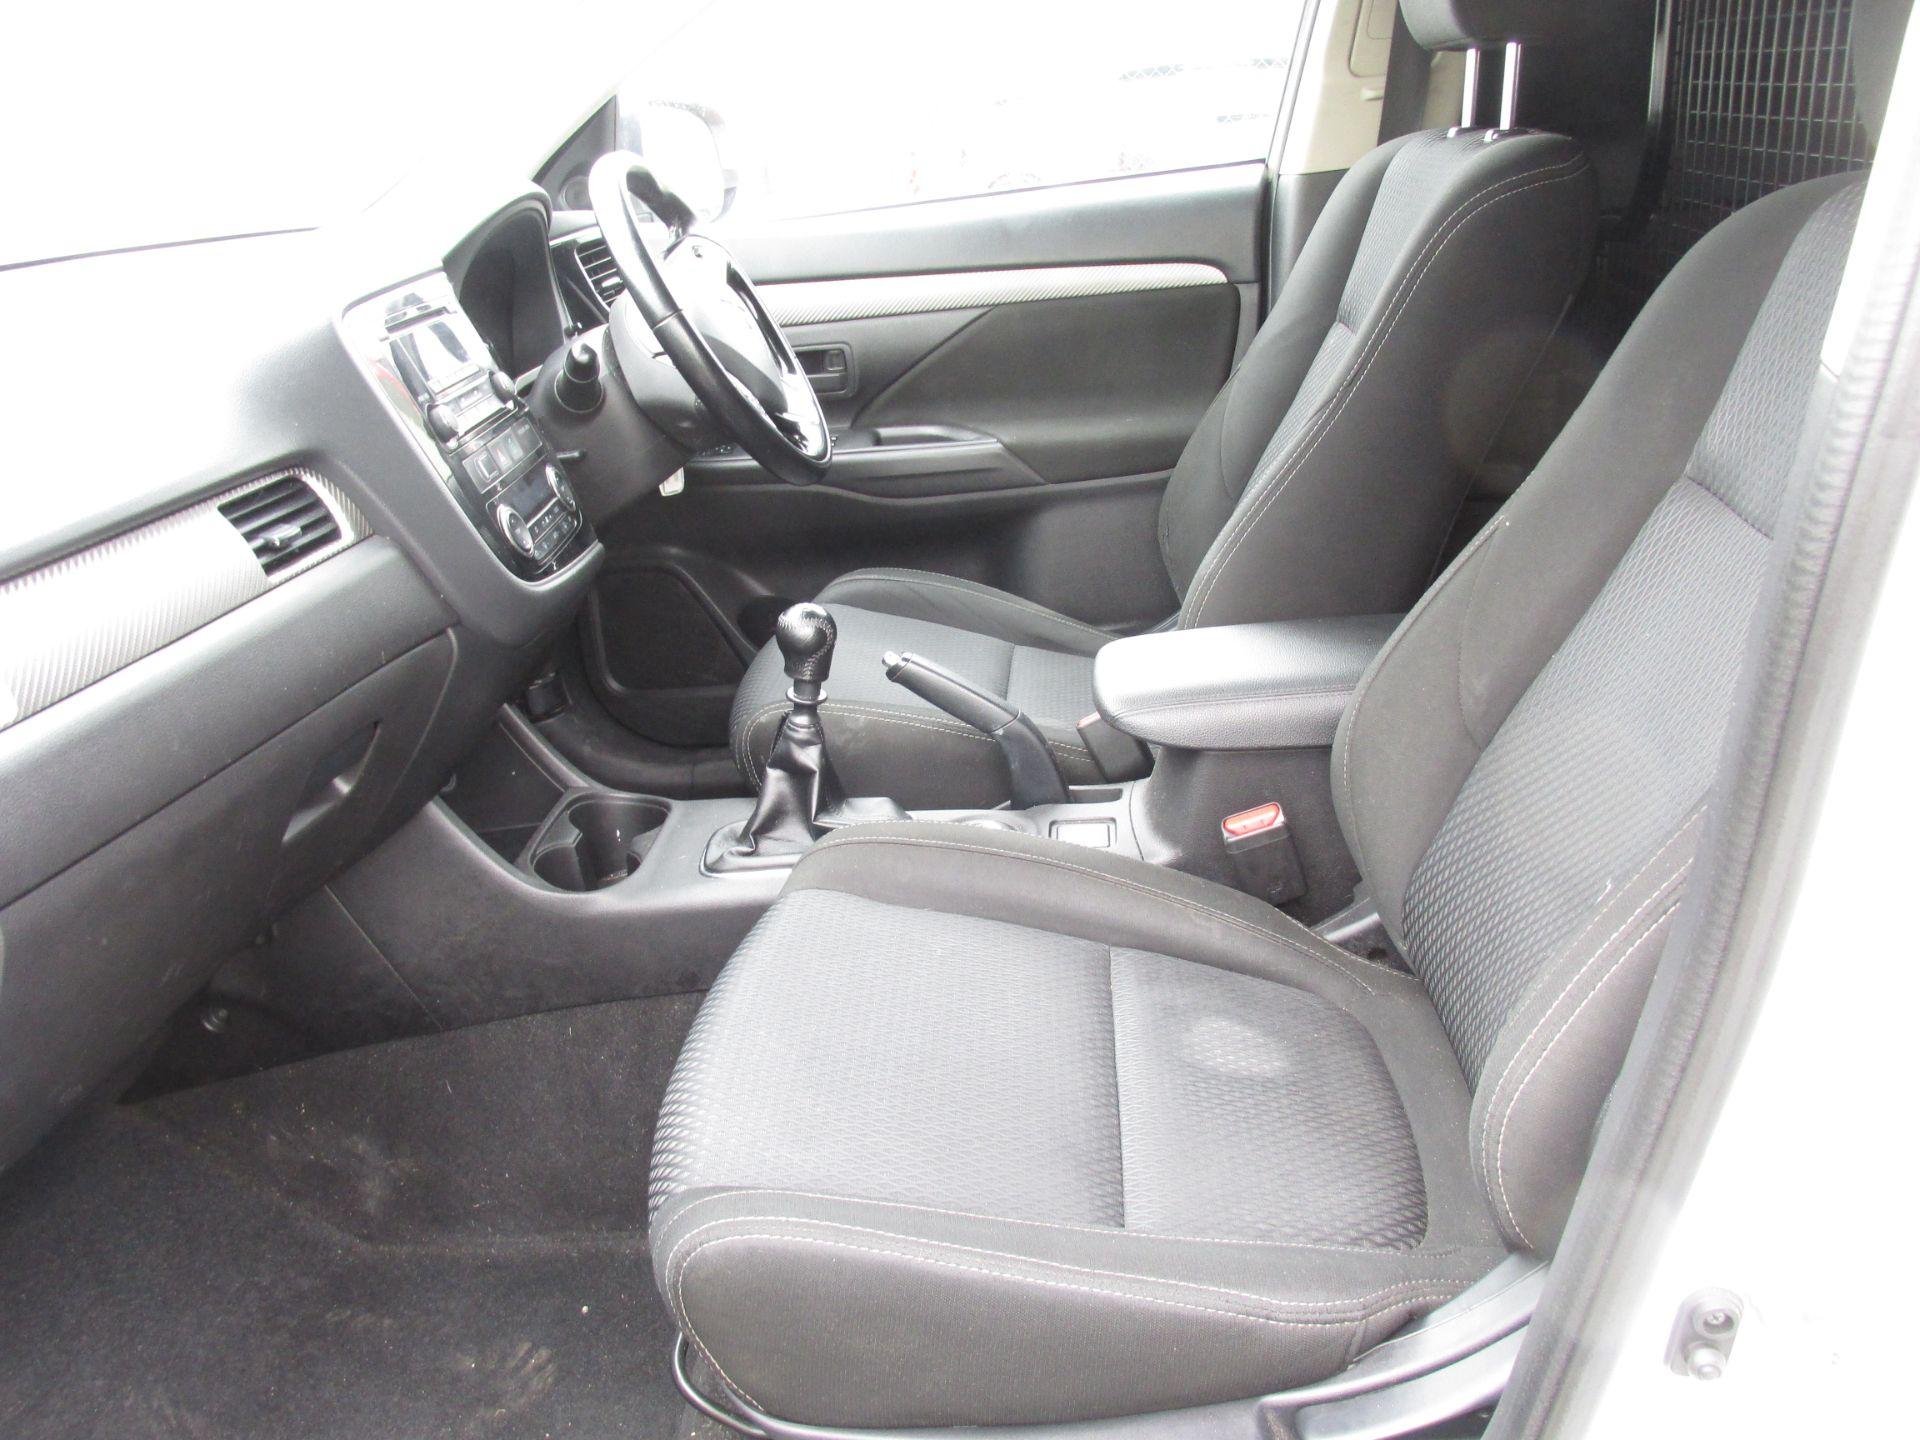 2016 Mitsubishi Outlander 4WD 6MT 16MY 4DR (162D5830) Image 10